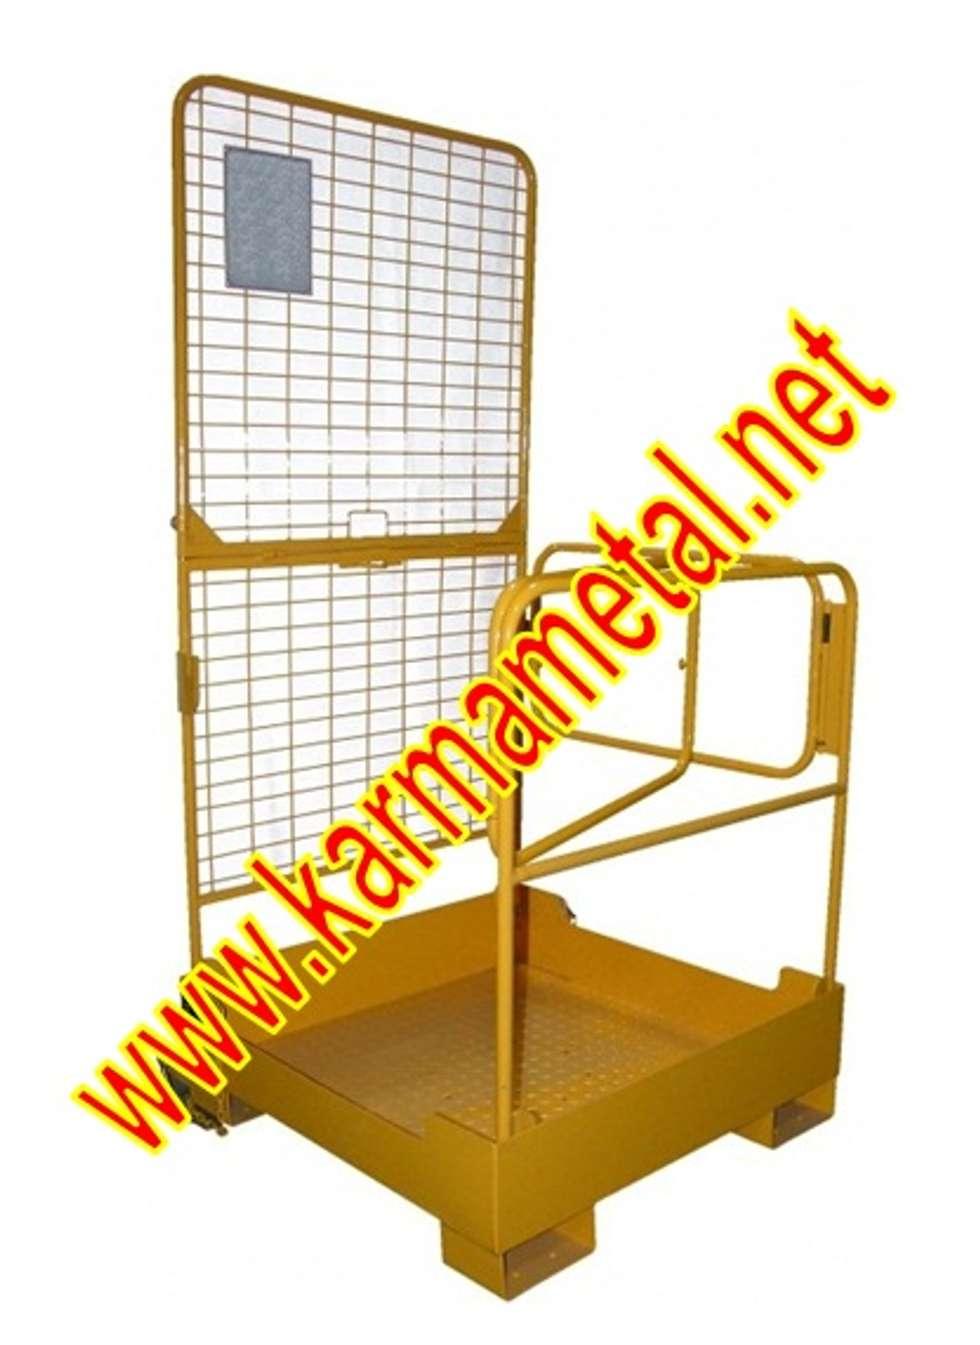 KARMA METAL – KARMA METAL-Forklift İnsan Personel  Adam Taşıma Kaldırma Sepeti: endüstriyel tarz tarz Mutfak